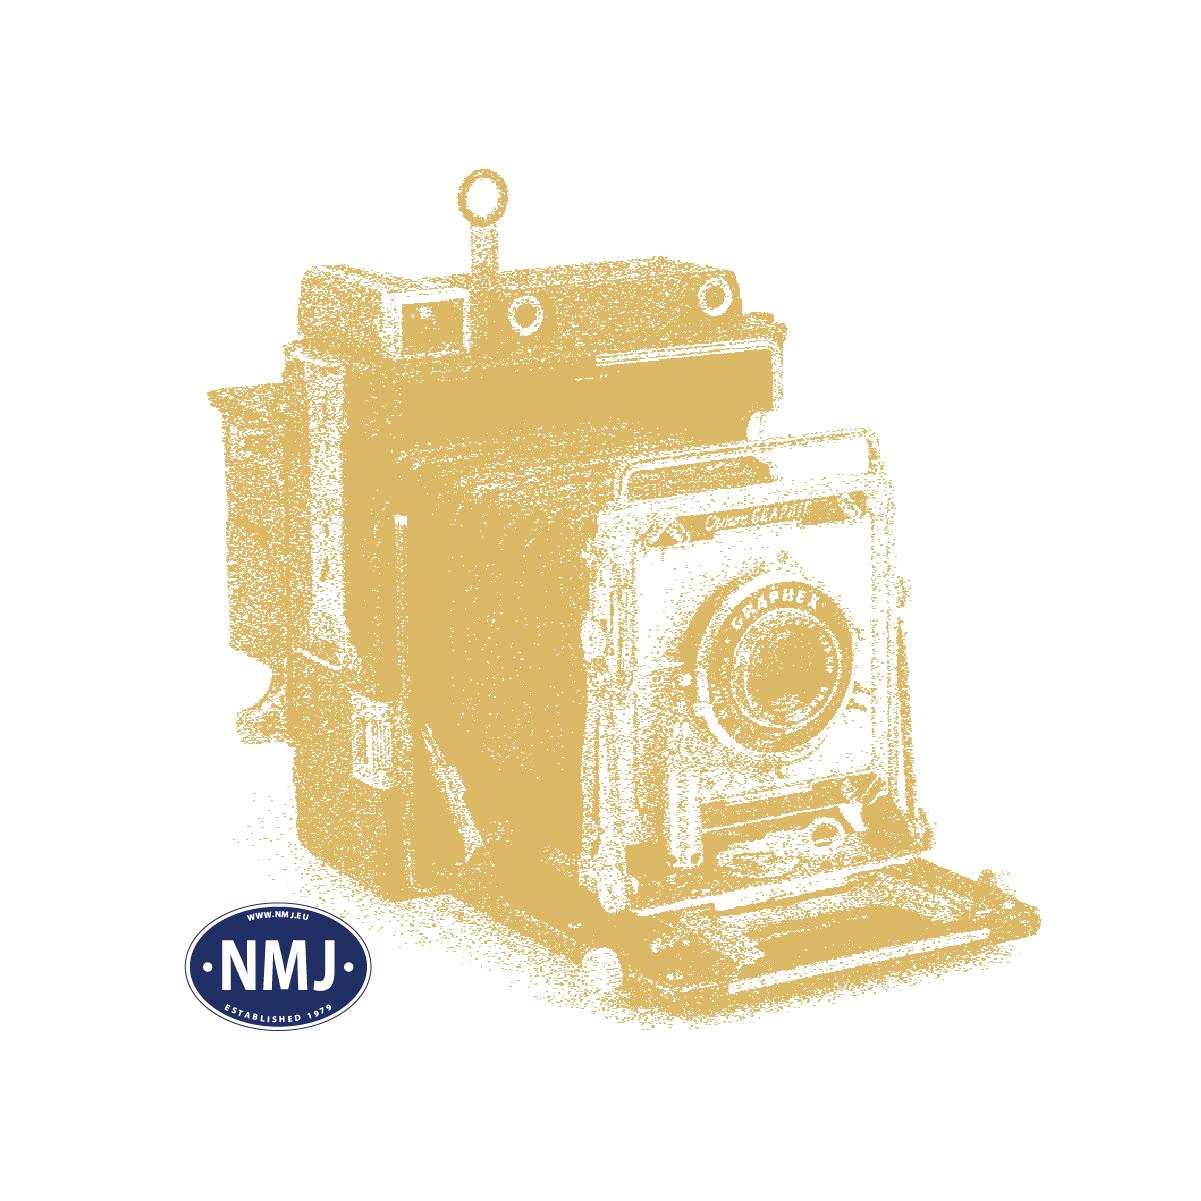 NMJT94003 - NMJ Topline SJ Y1 1308, Orange, DCC m/ Sound